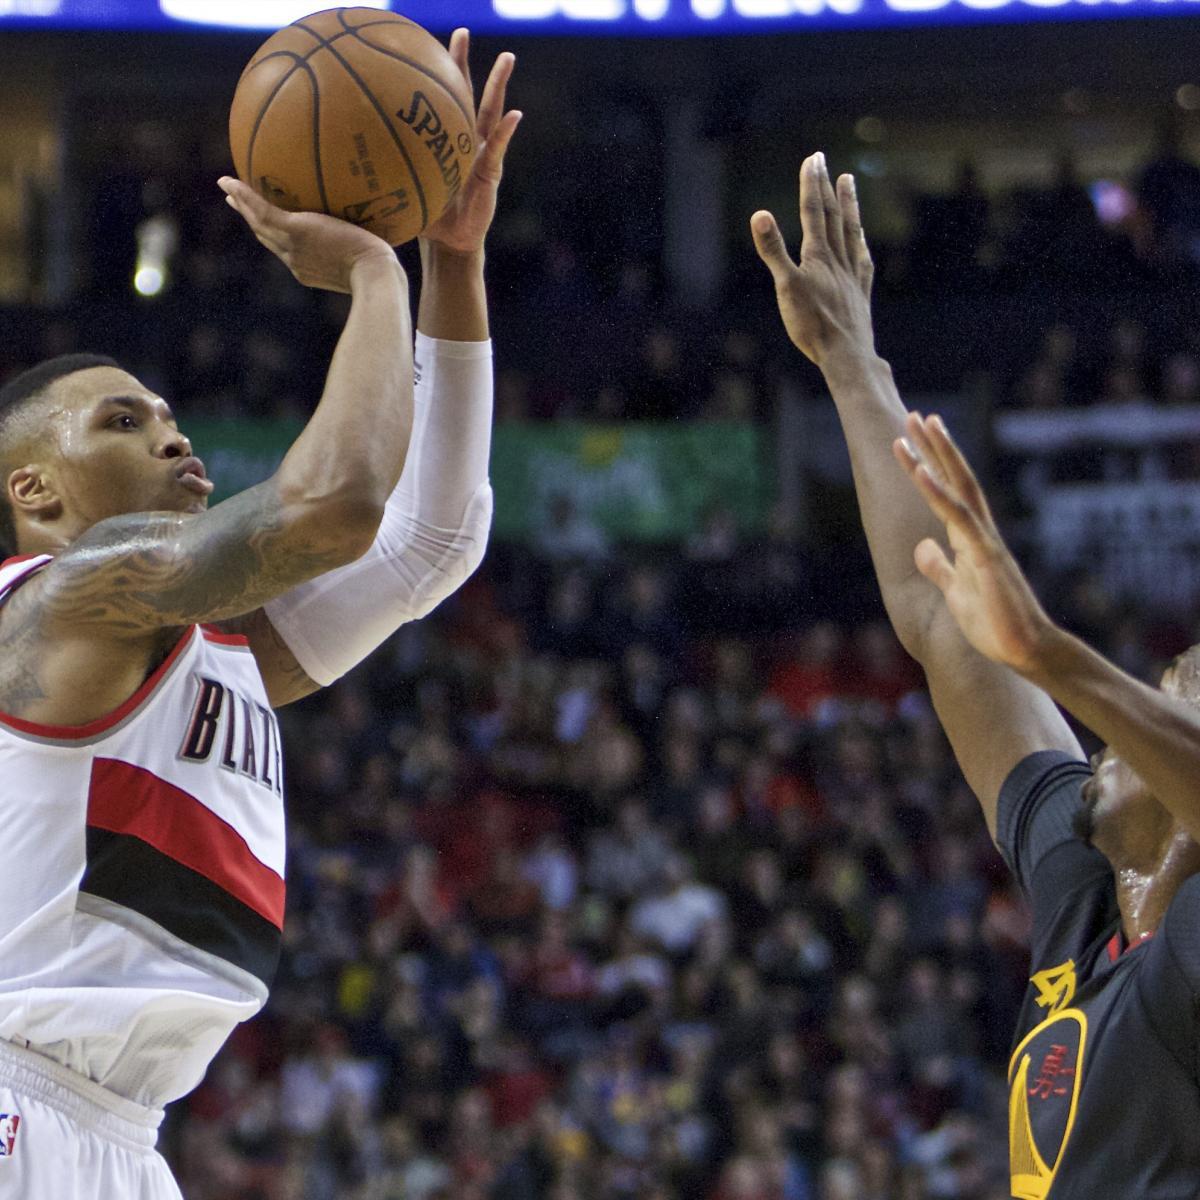 Portland Blazers Live Score: Warriors Vs. Trail Blazers: Score, Highlights, Reaction